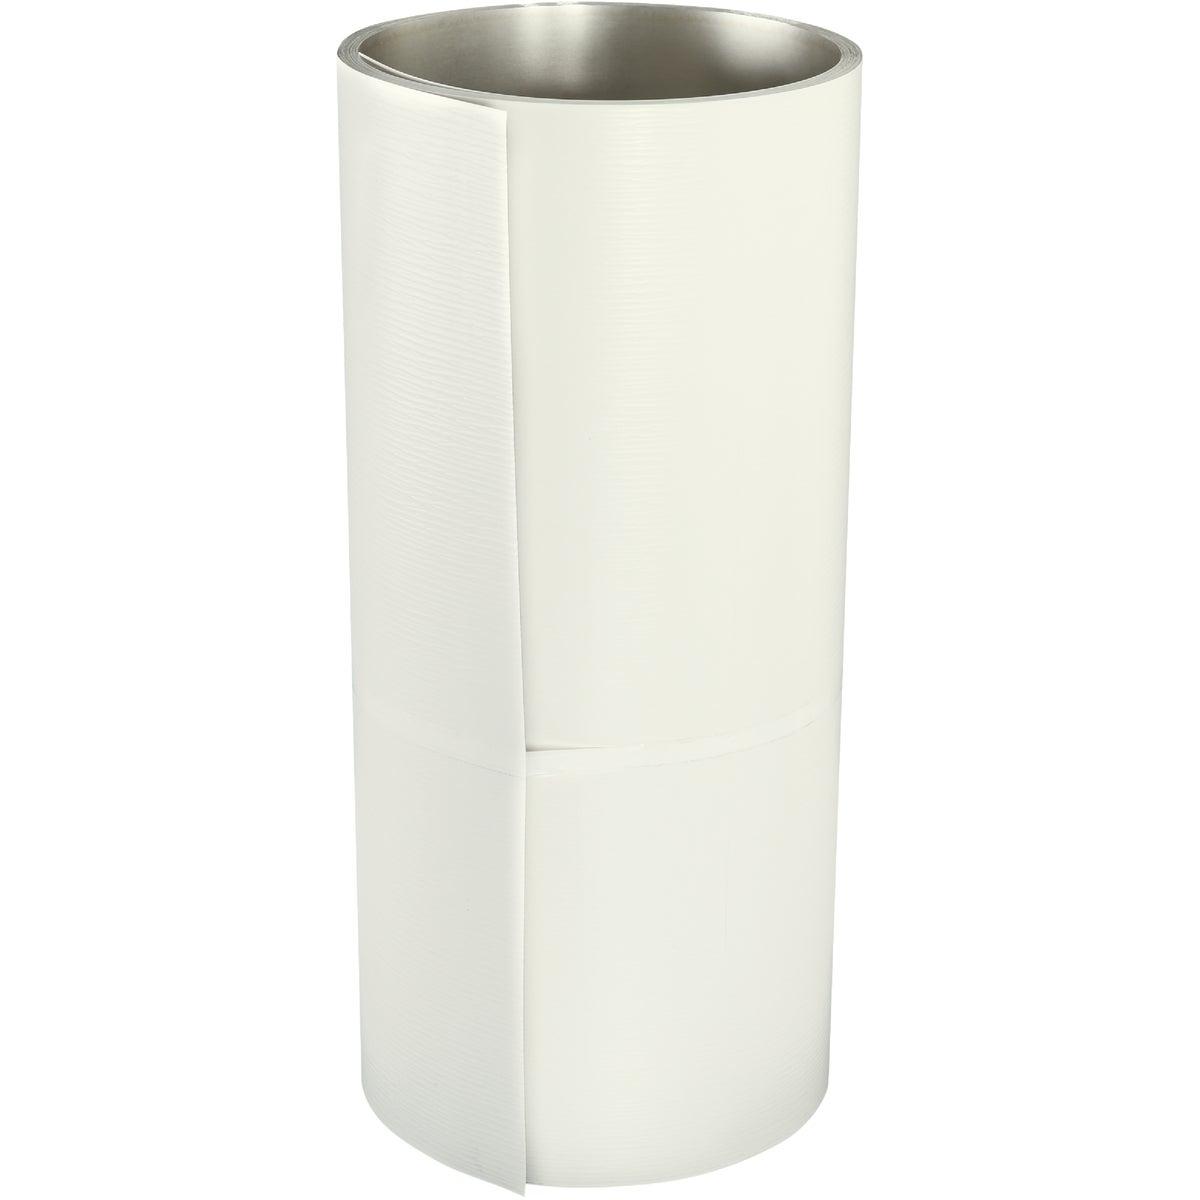 24X50 WHT PVC TRIM COIL